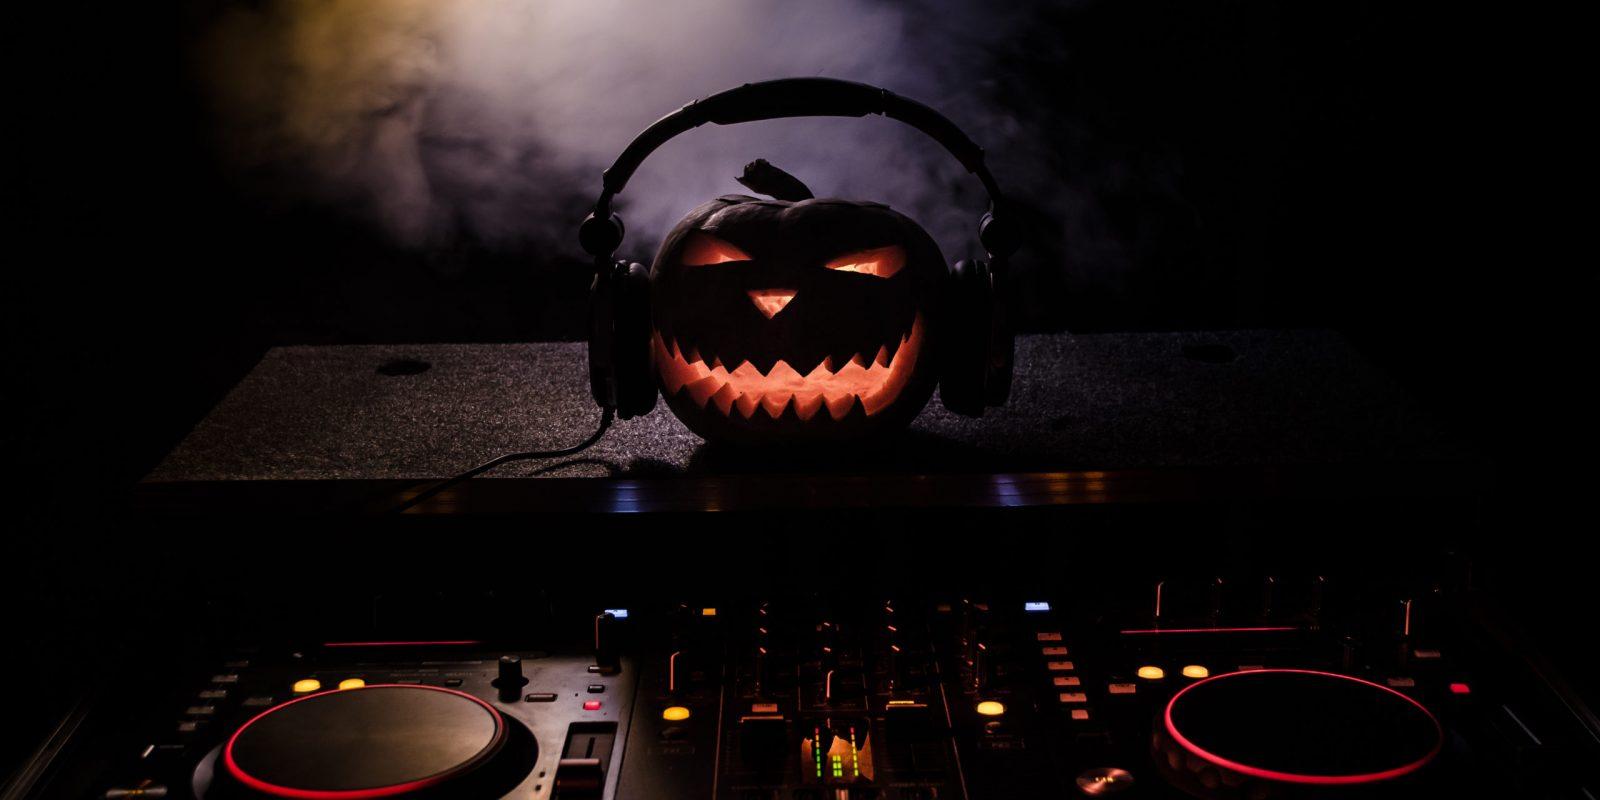 Halloween,Pumpkin,On,A,Dj,Table,With,Headphones,On,Dark